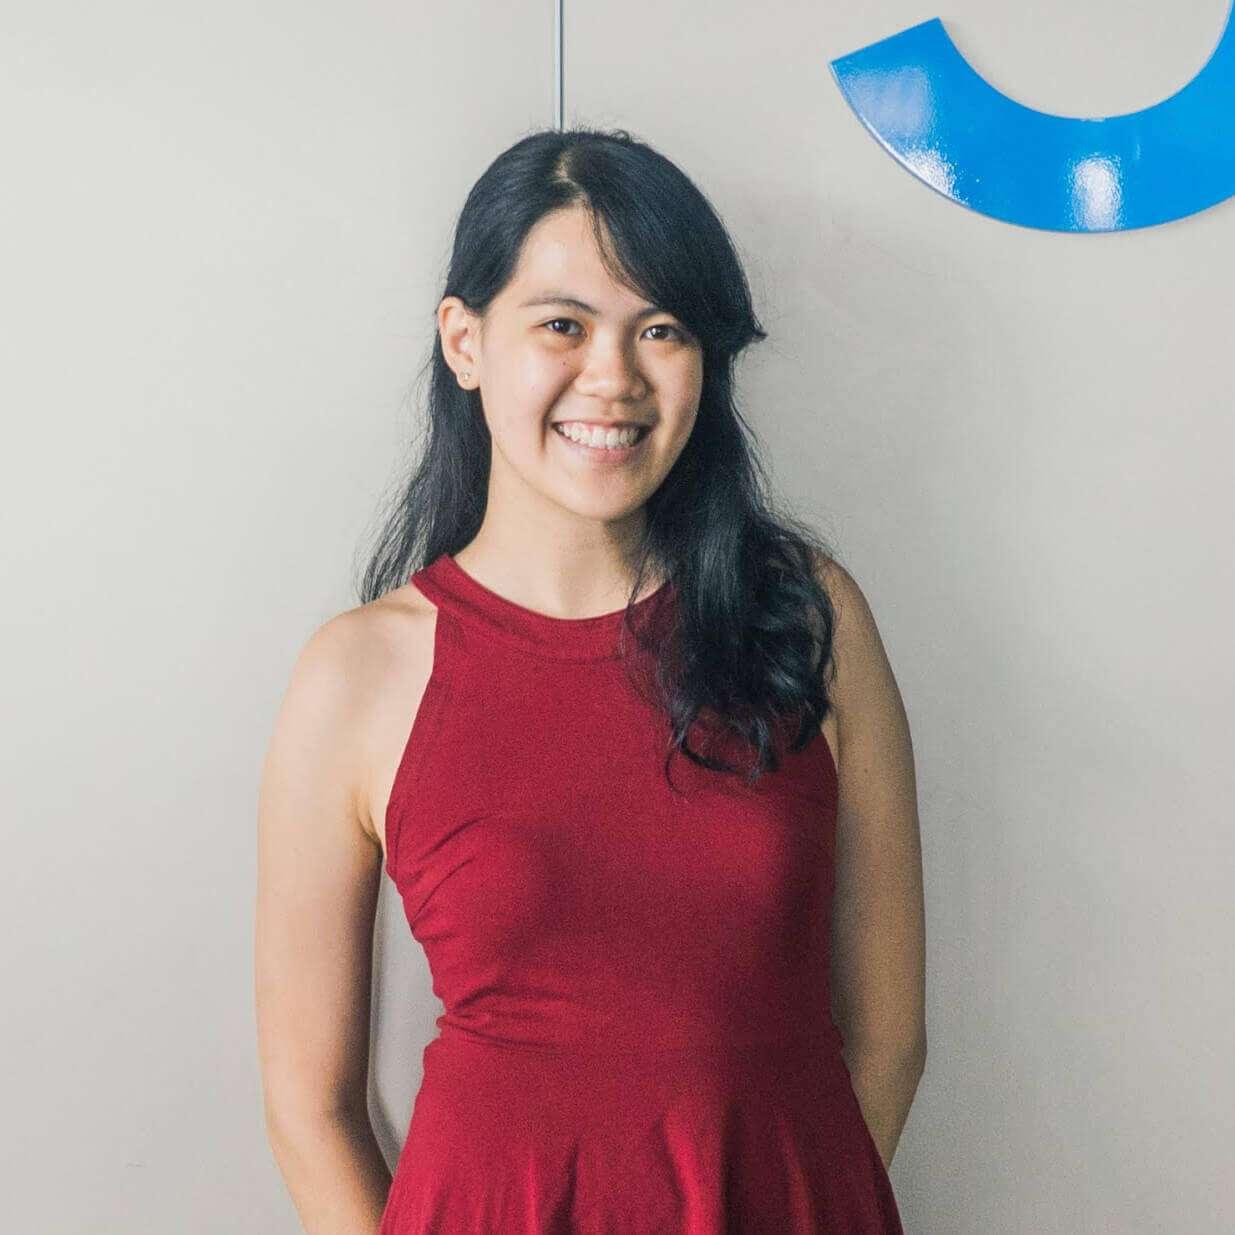 Sarah Tan, Google's Creative Lab